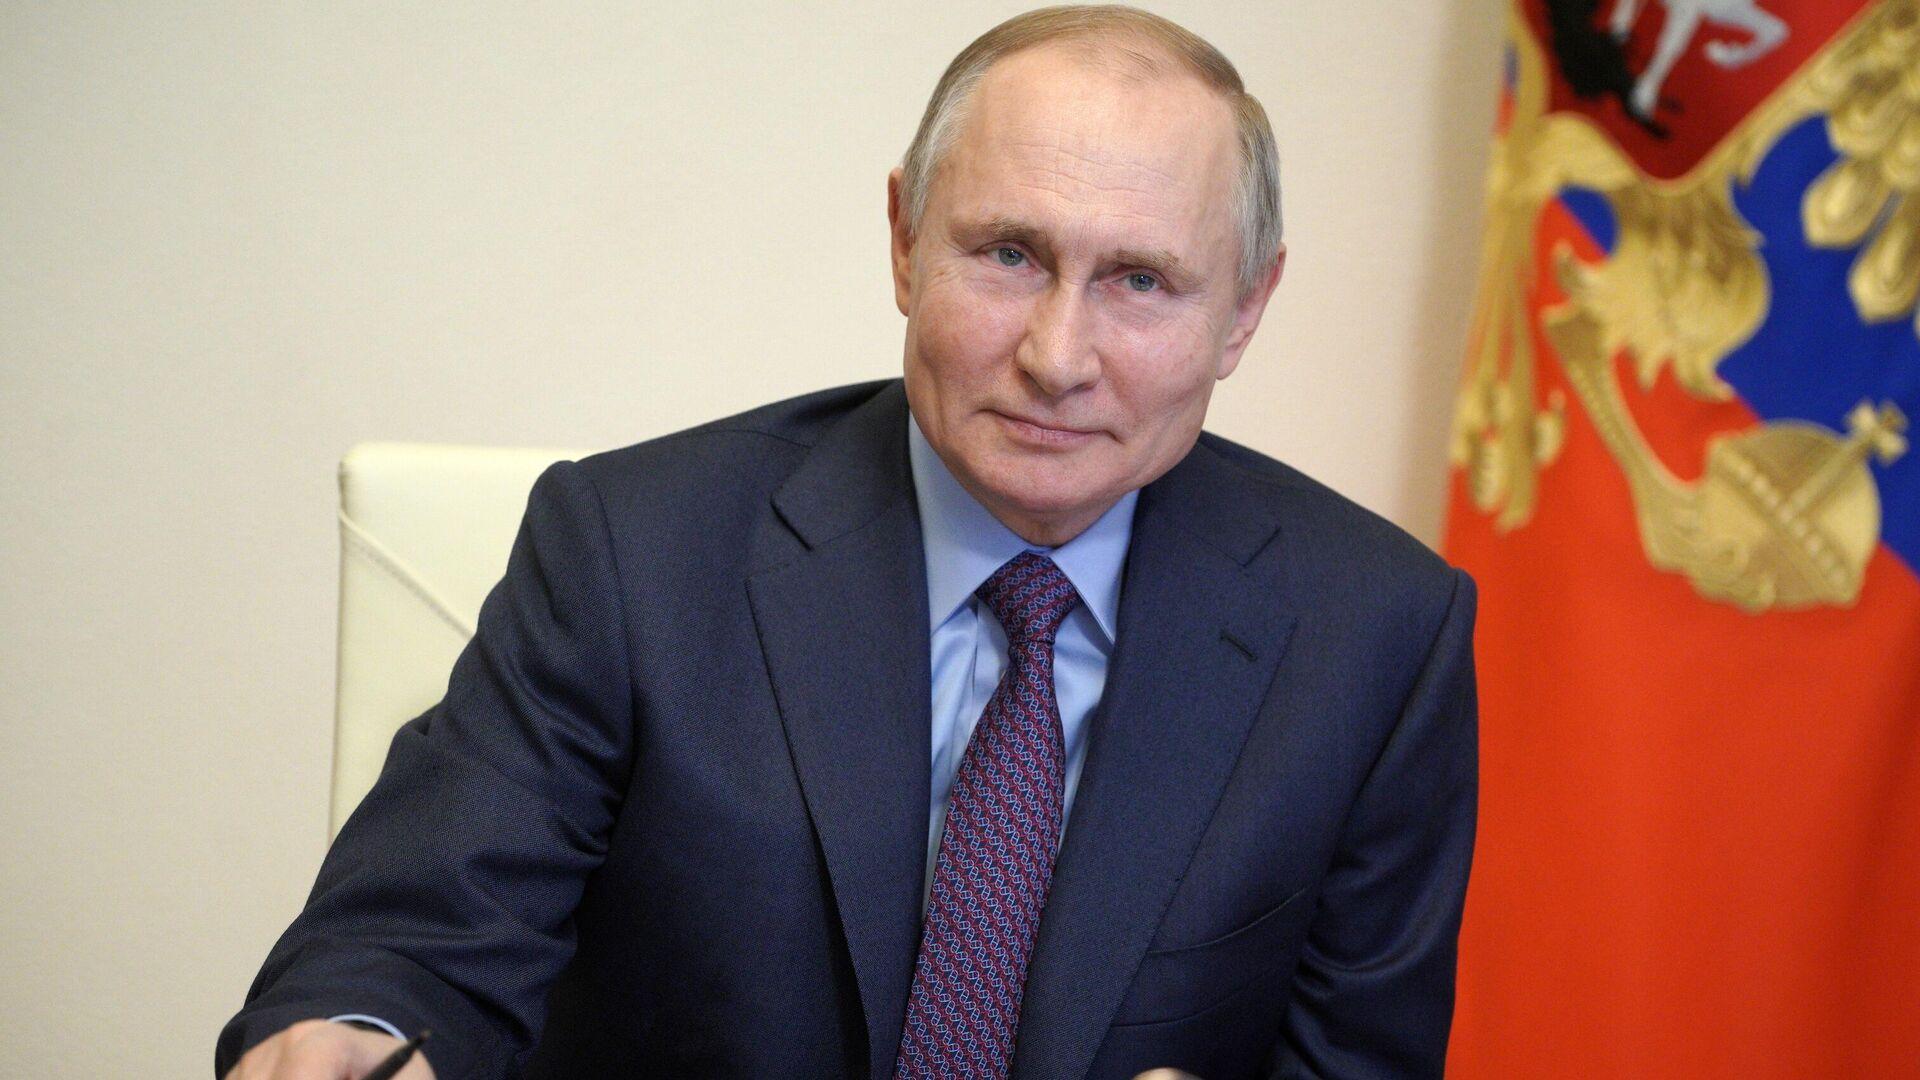 Vladímir Putin, presidente de Rusia - Sputnik Mundo, 1920, 25.03.2021